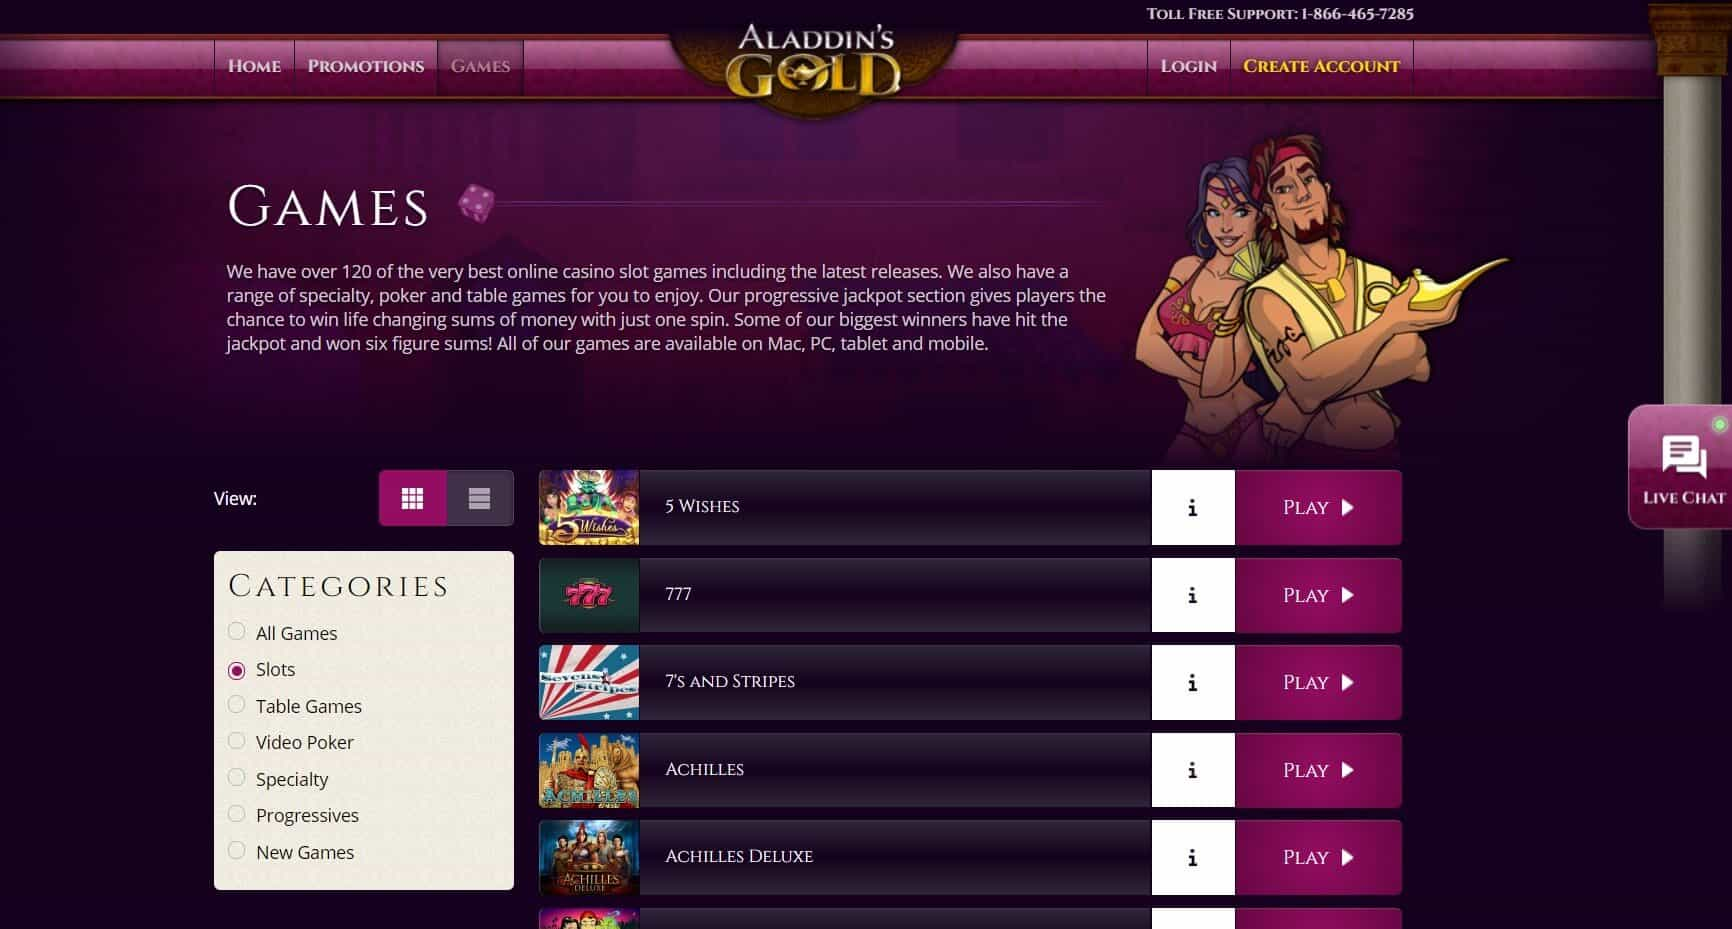 Aladdins Gold Casino Game list